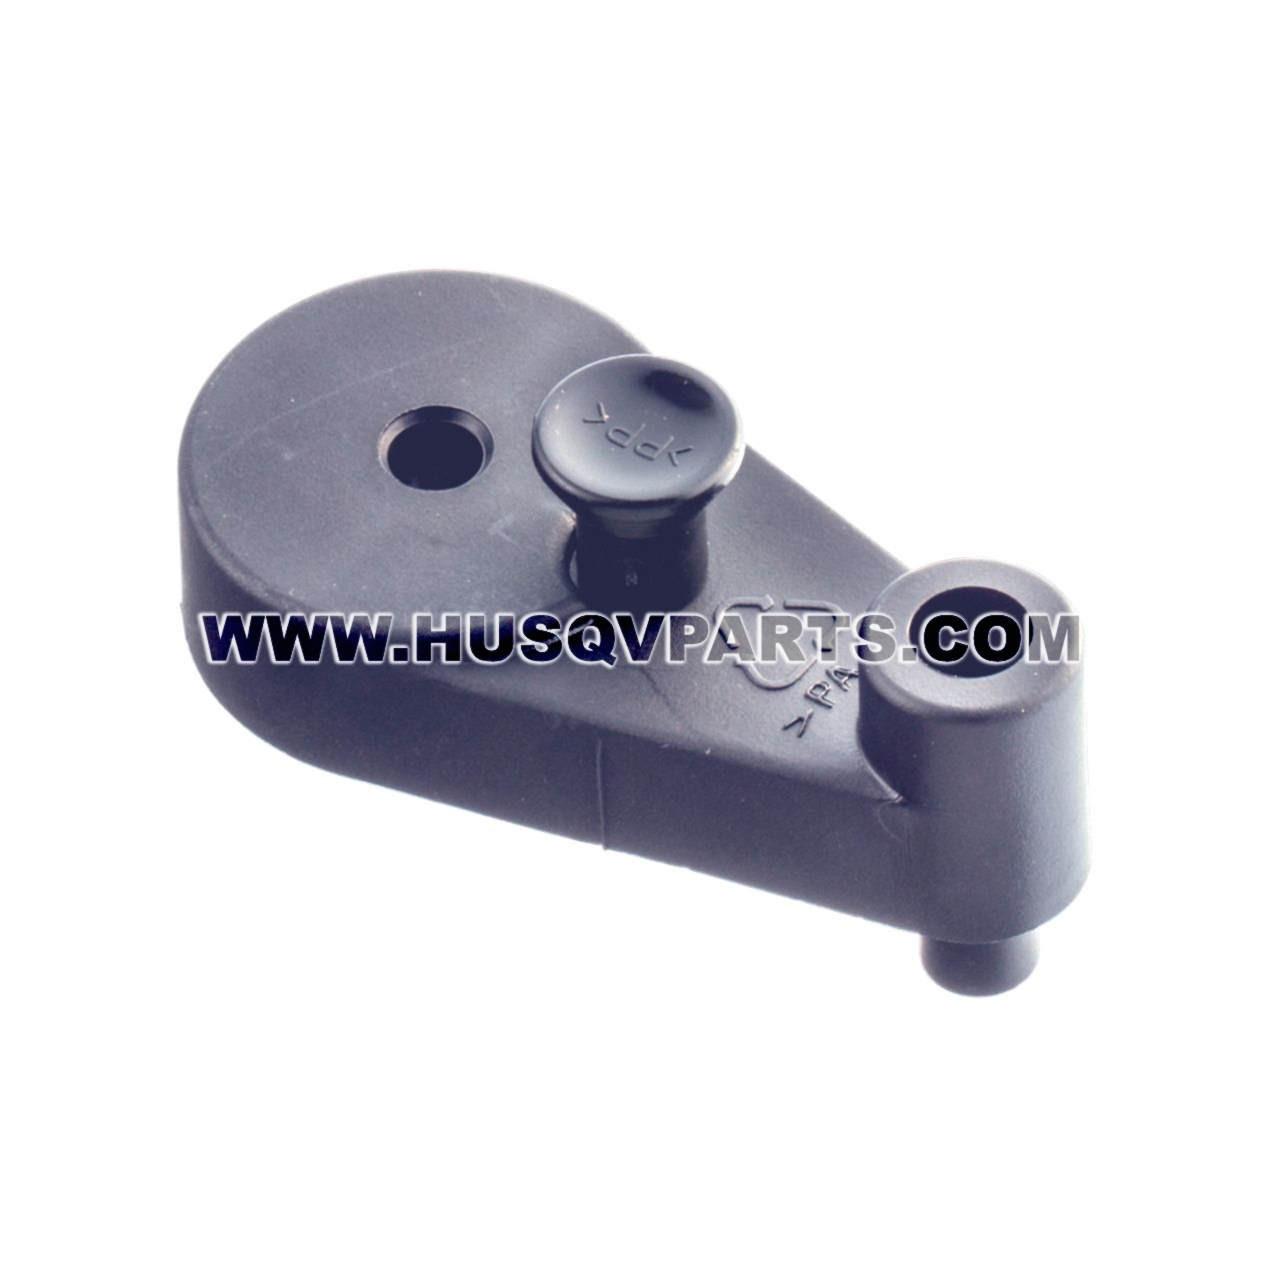 HUSQVARNA Roller Holder 371399301 Image 1